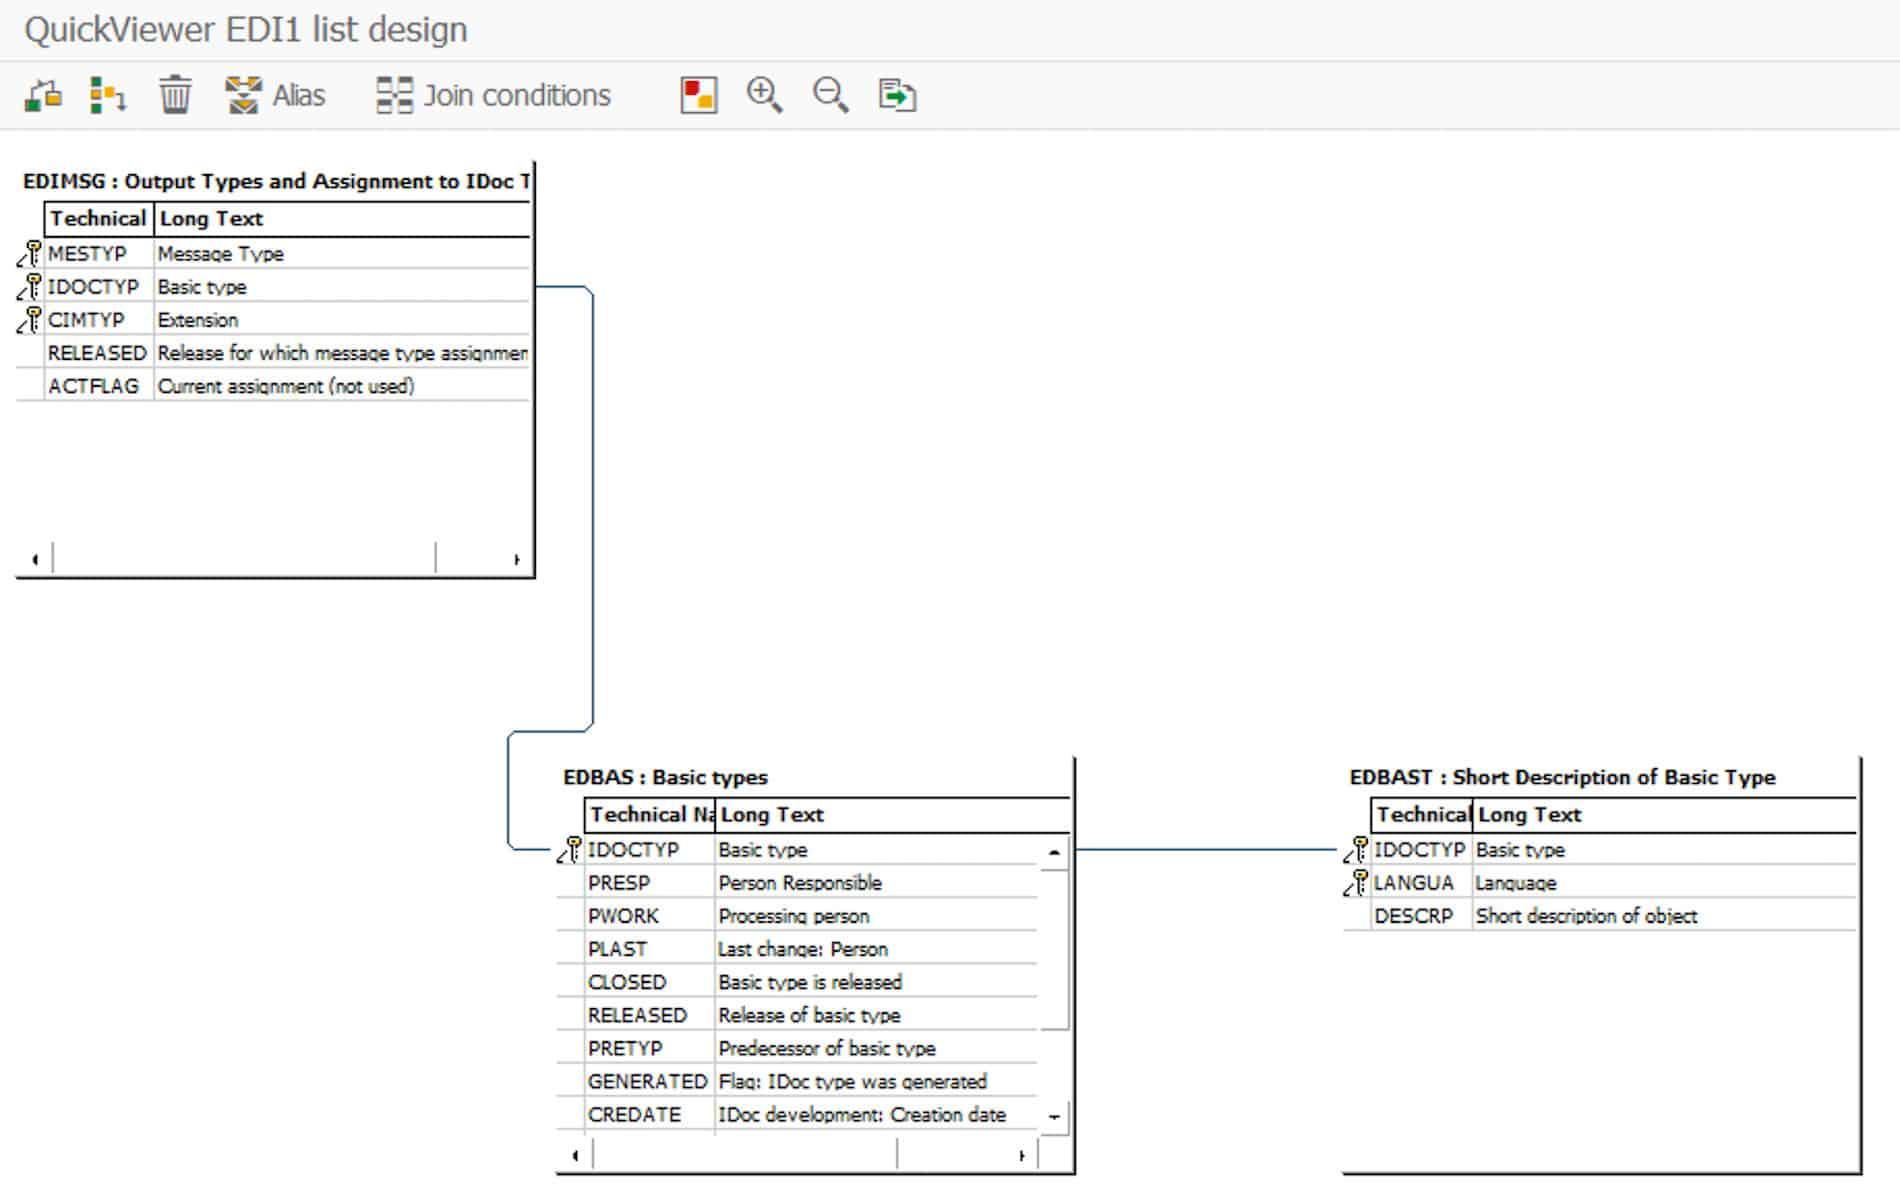 IDoc Basics: IDoc Basic Type and IDoc Message Type